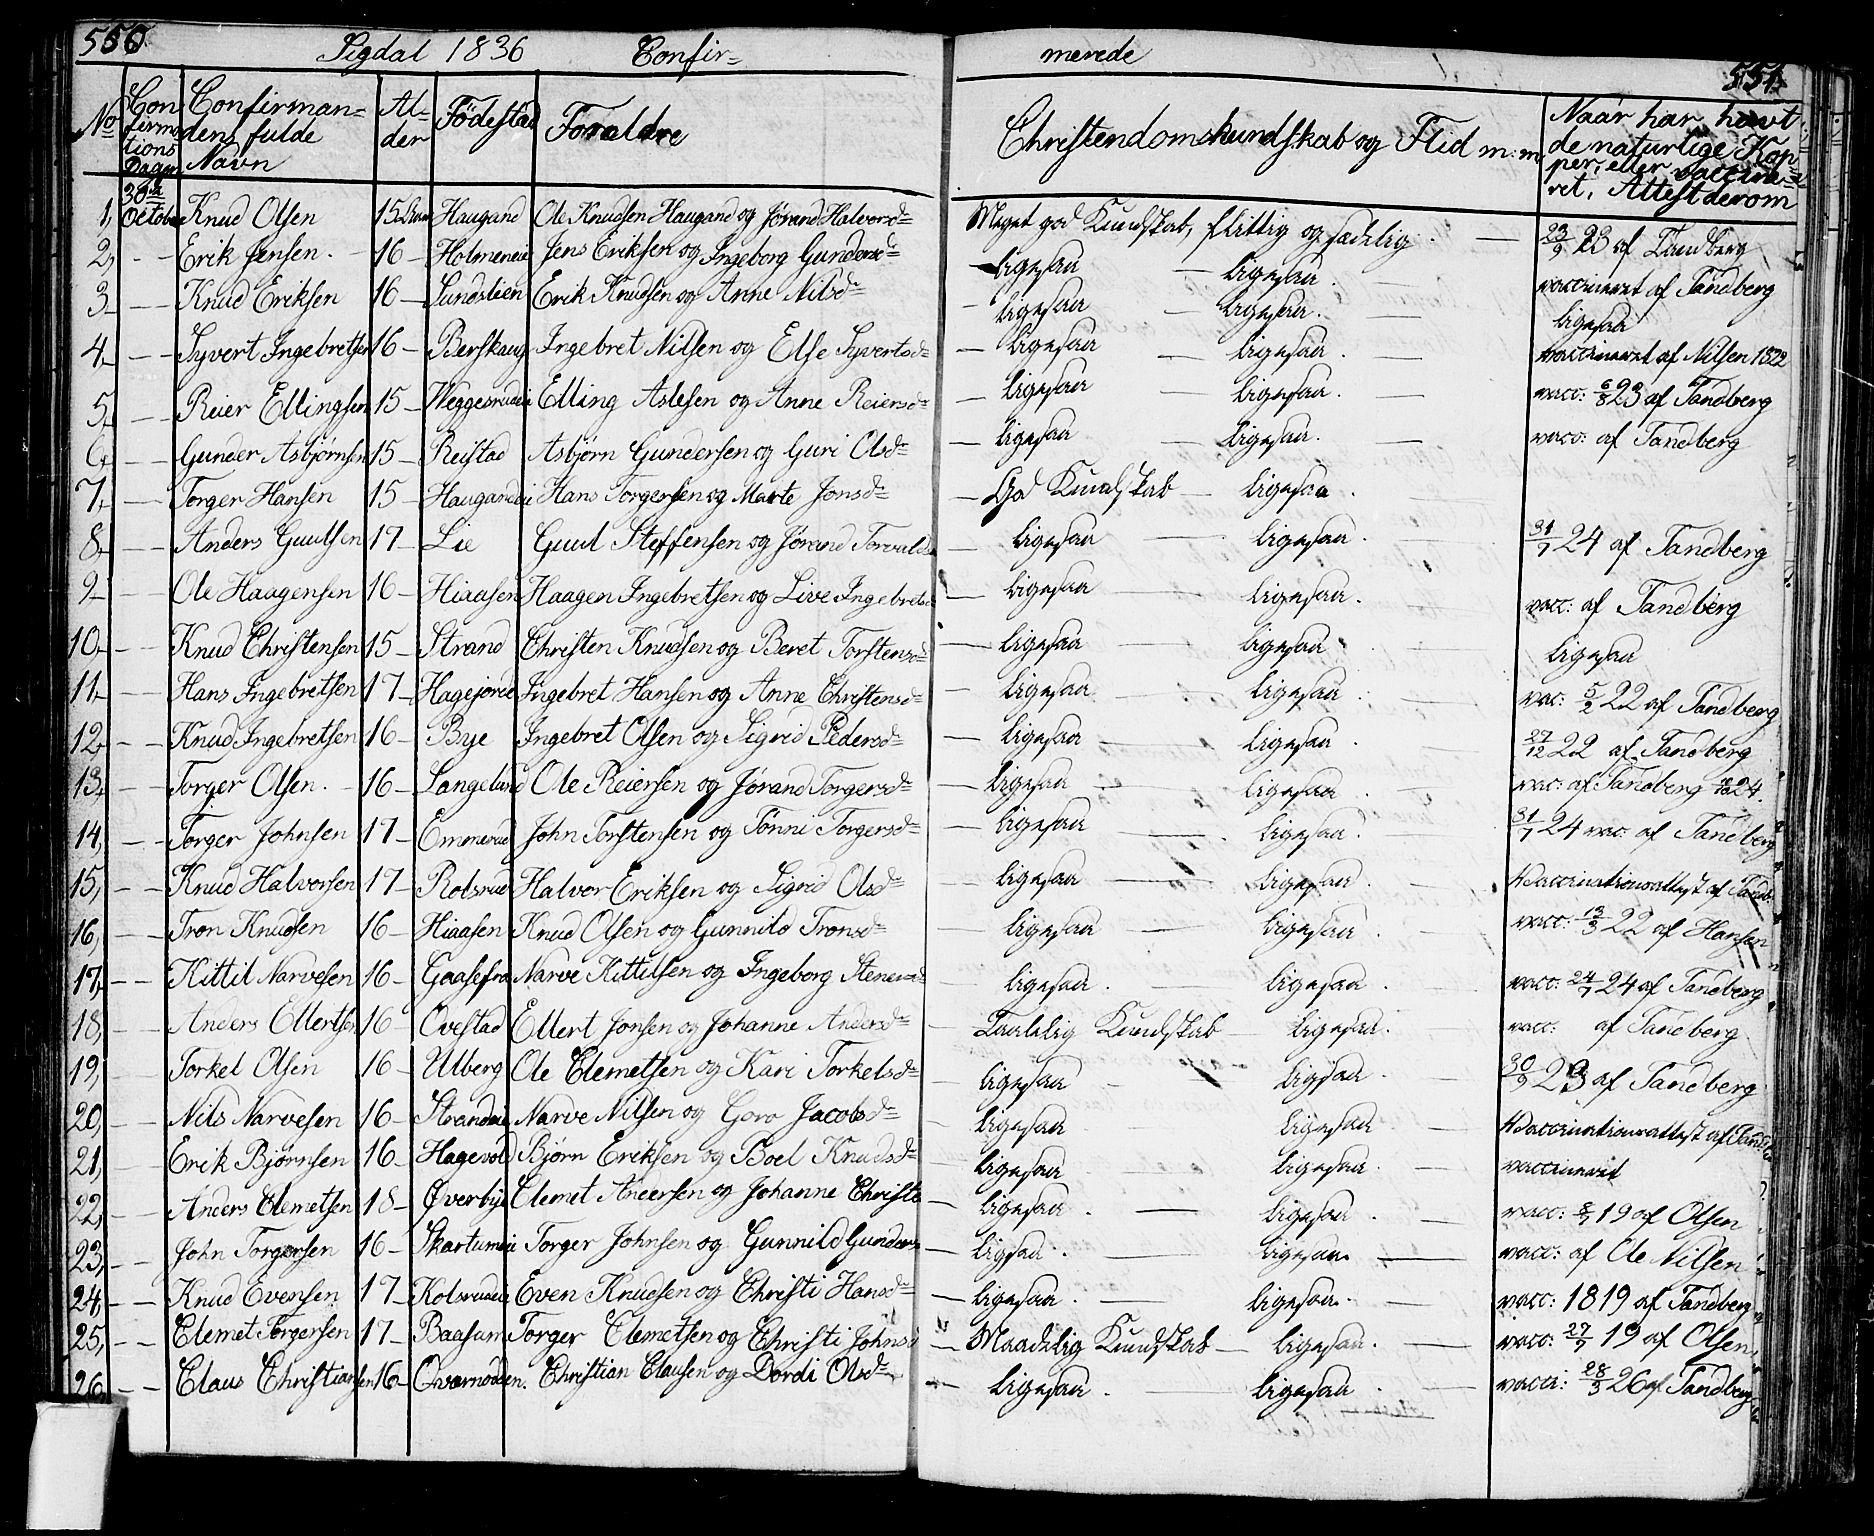 SAKO, Sigdal kirkebøker, G/Ga/L0002: Klokkerbok nr. I 2, 1835-1856, s. 550-551